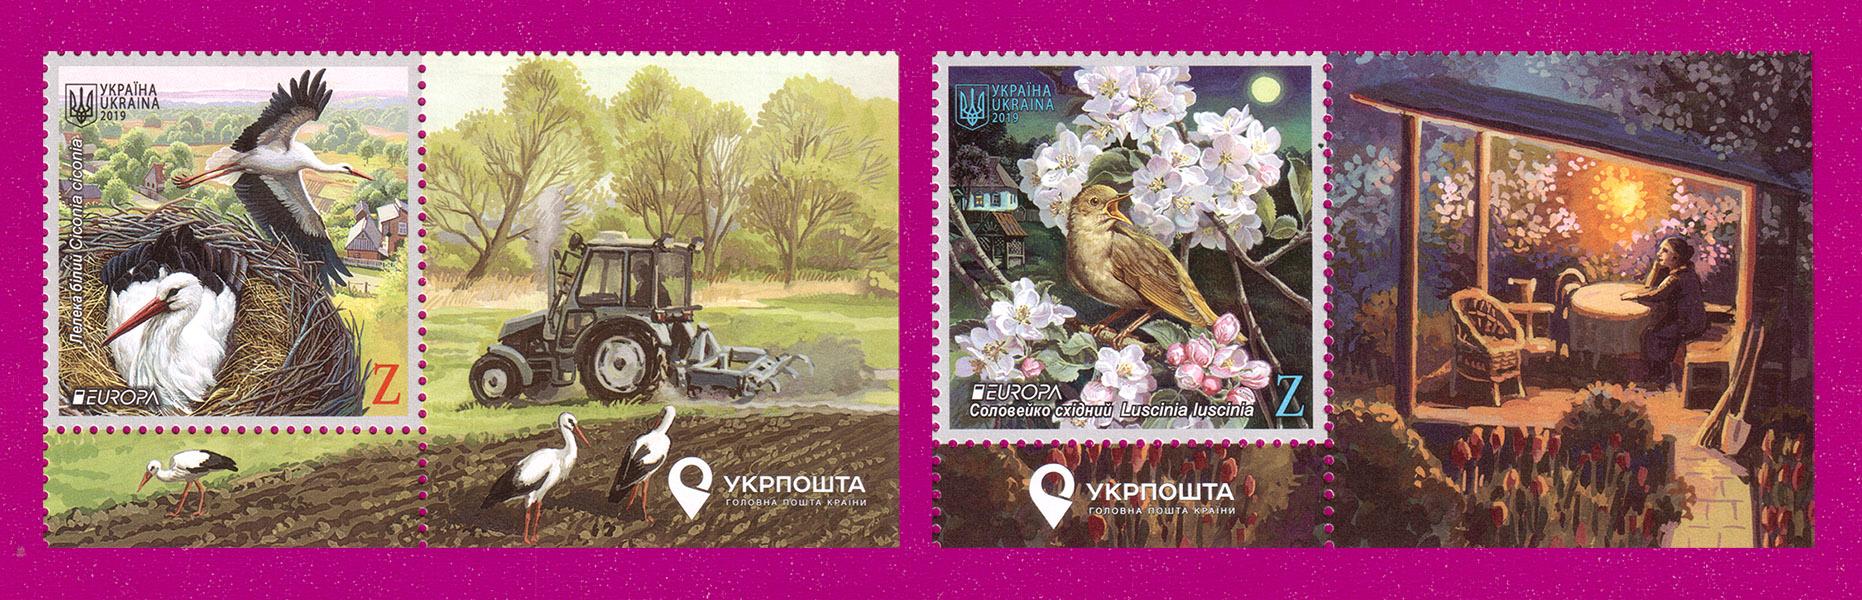 Ukraine stamps Ukrainian birds stork and nightingale with coupons SERIES